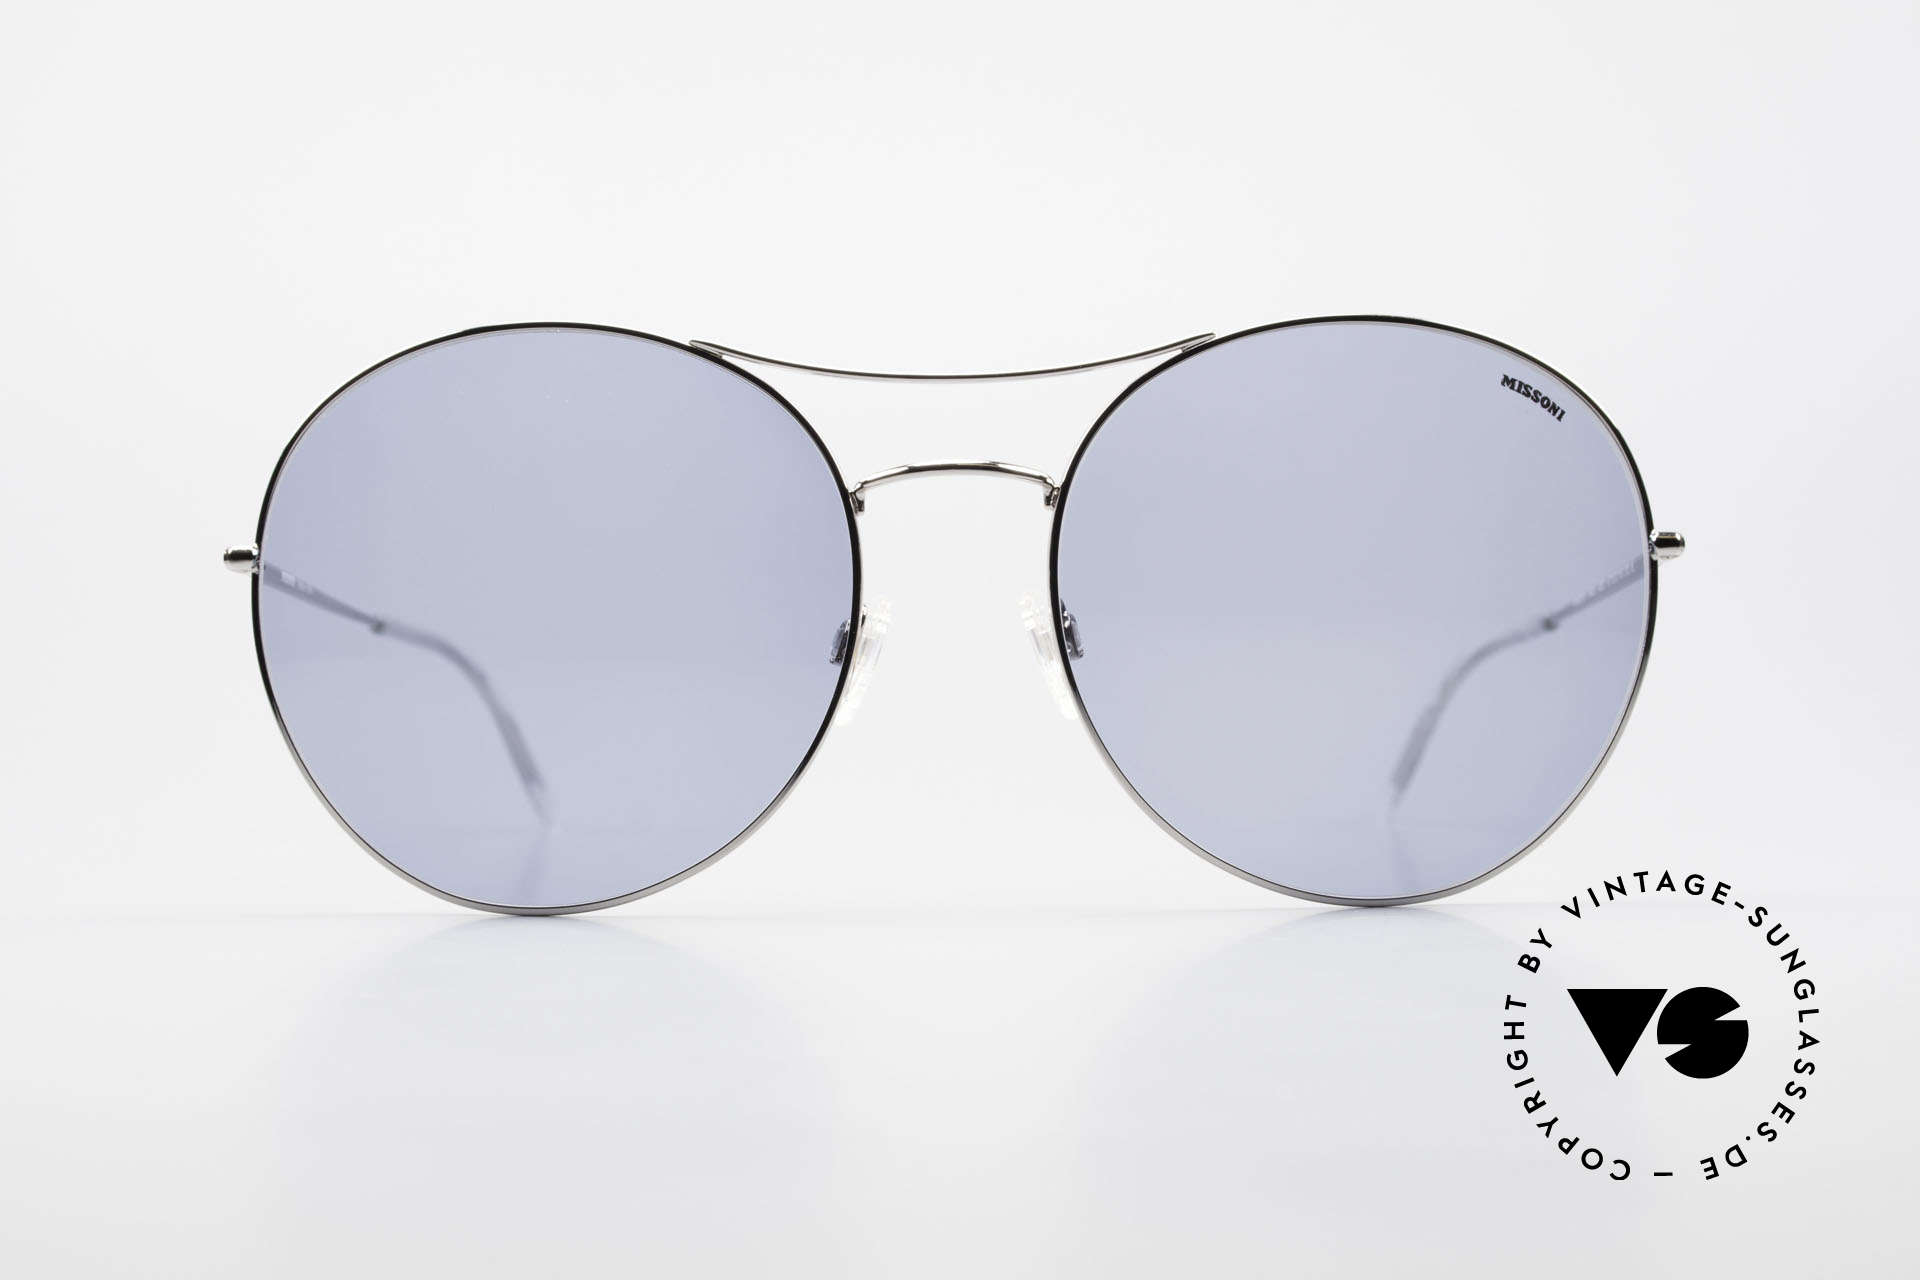 Missoni 0440 Huge XXL Aviator Sunglasses, 90s oversized aviator sunglasses, 64mm frame height, Made for Men and Women